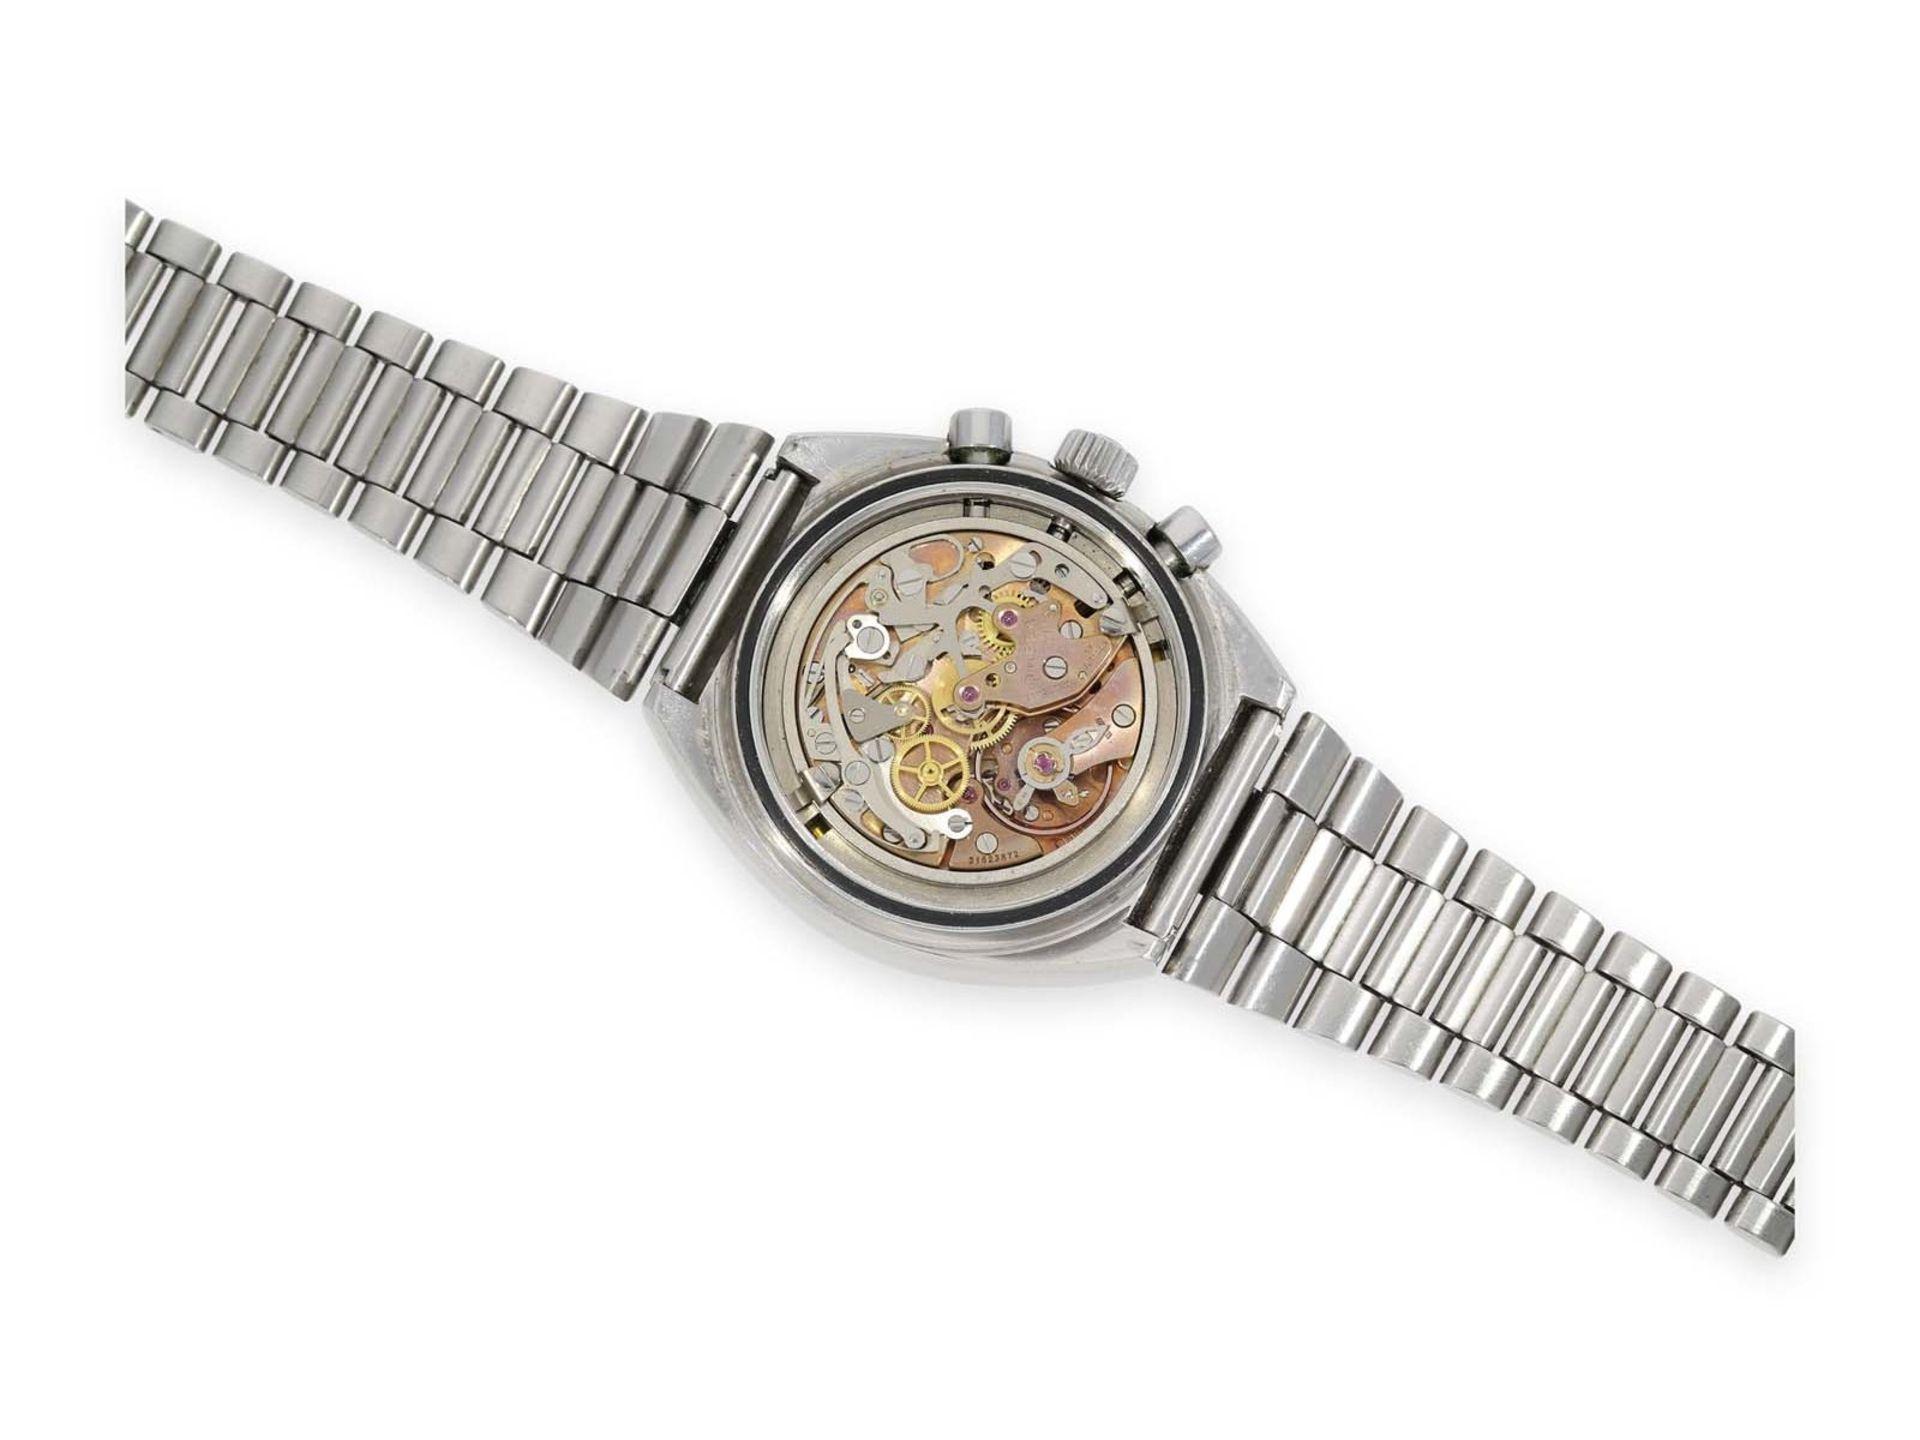 "Wristwatch: vintage Omega Speedmaster Chronograph ""Mark II"", reference 145.014, ca. 1970 - Bild 2 aus 3"